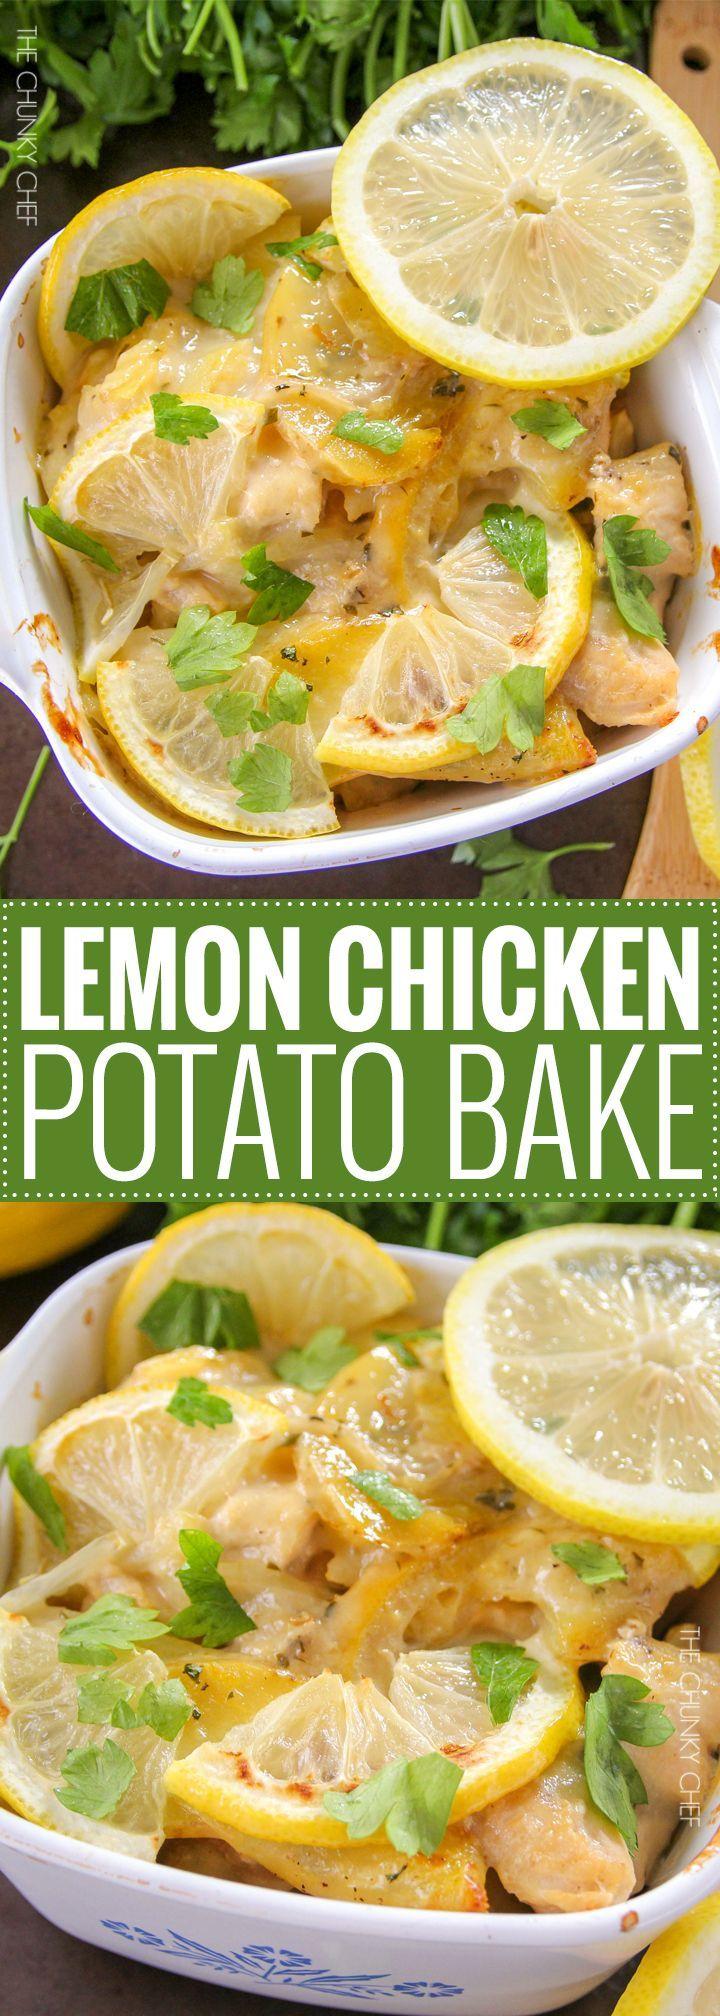 Lemon Chicken And Potato Bake